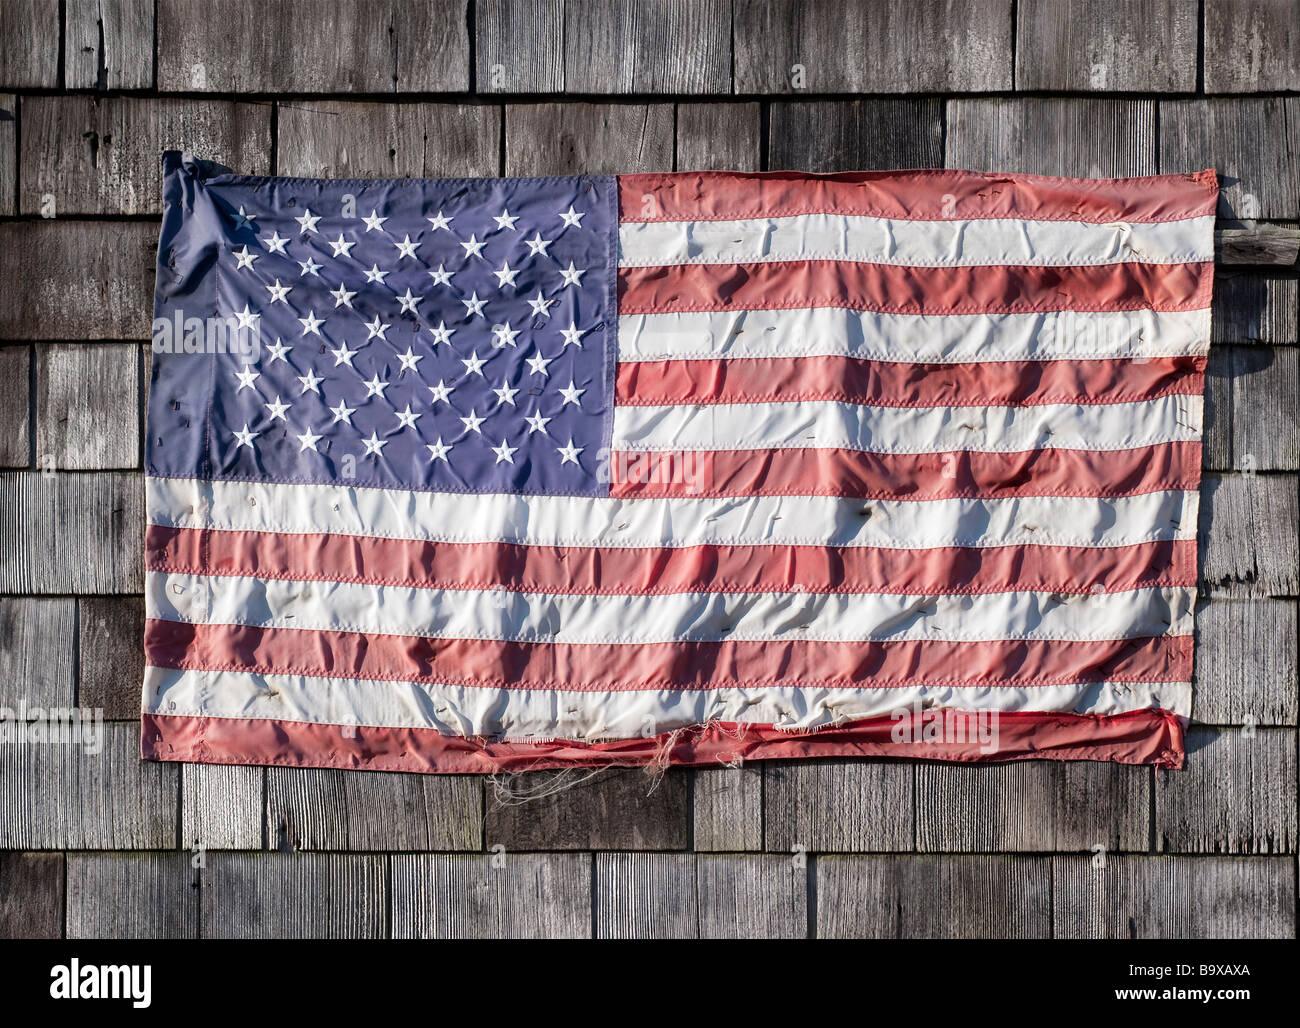 Porte drapeau Américain Photo Stock